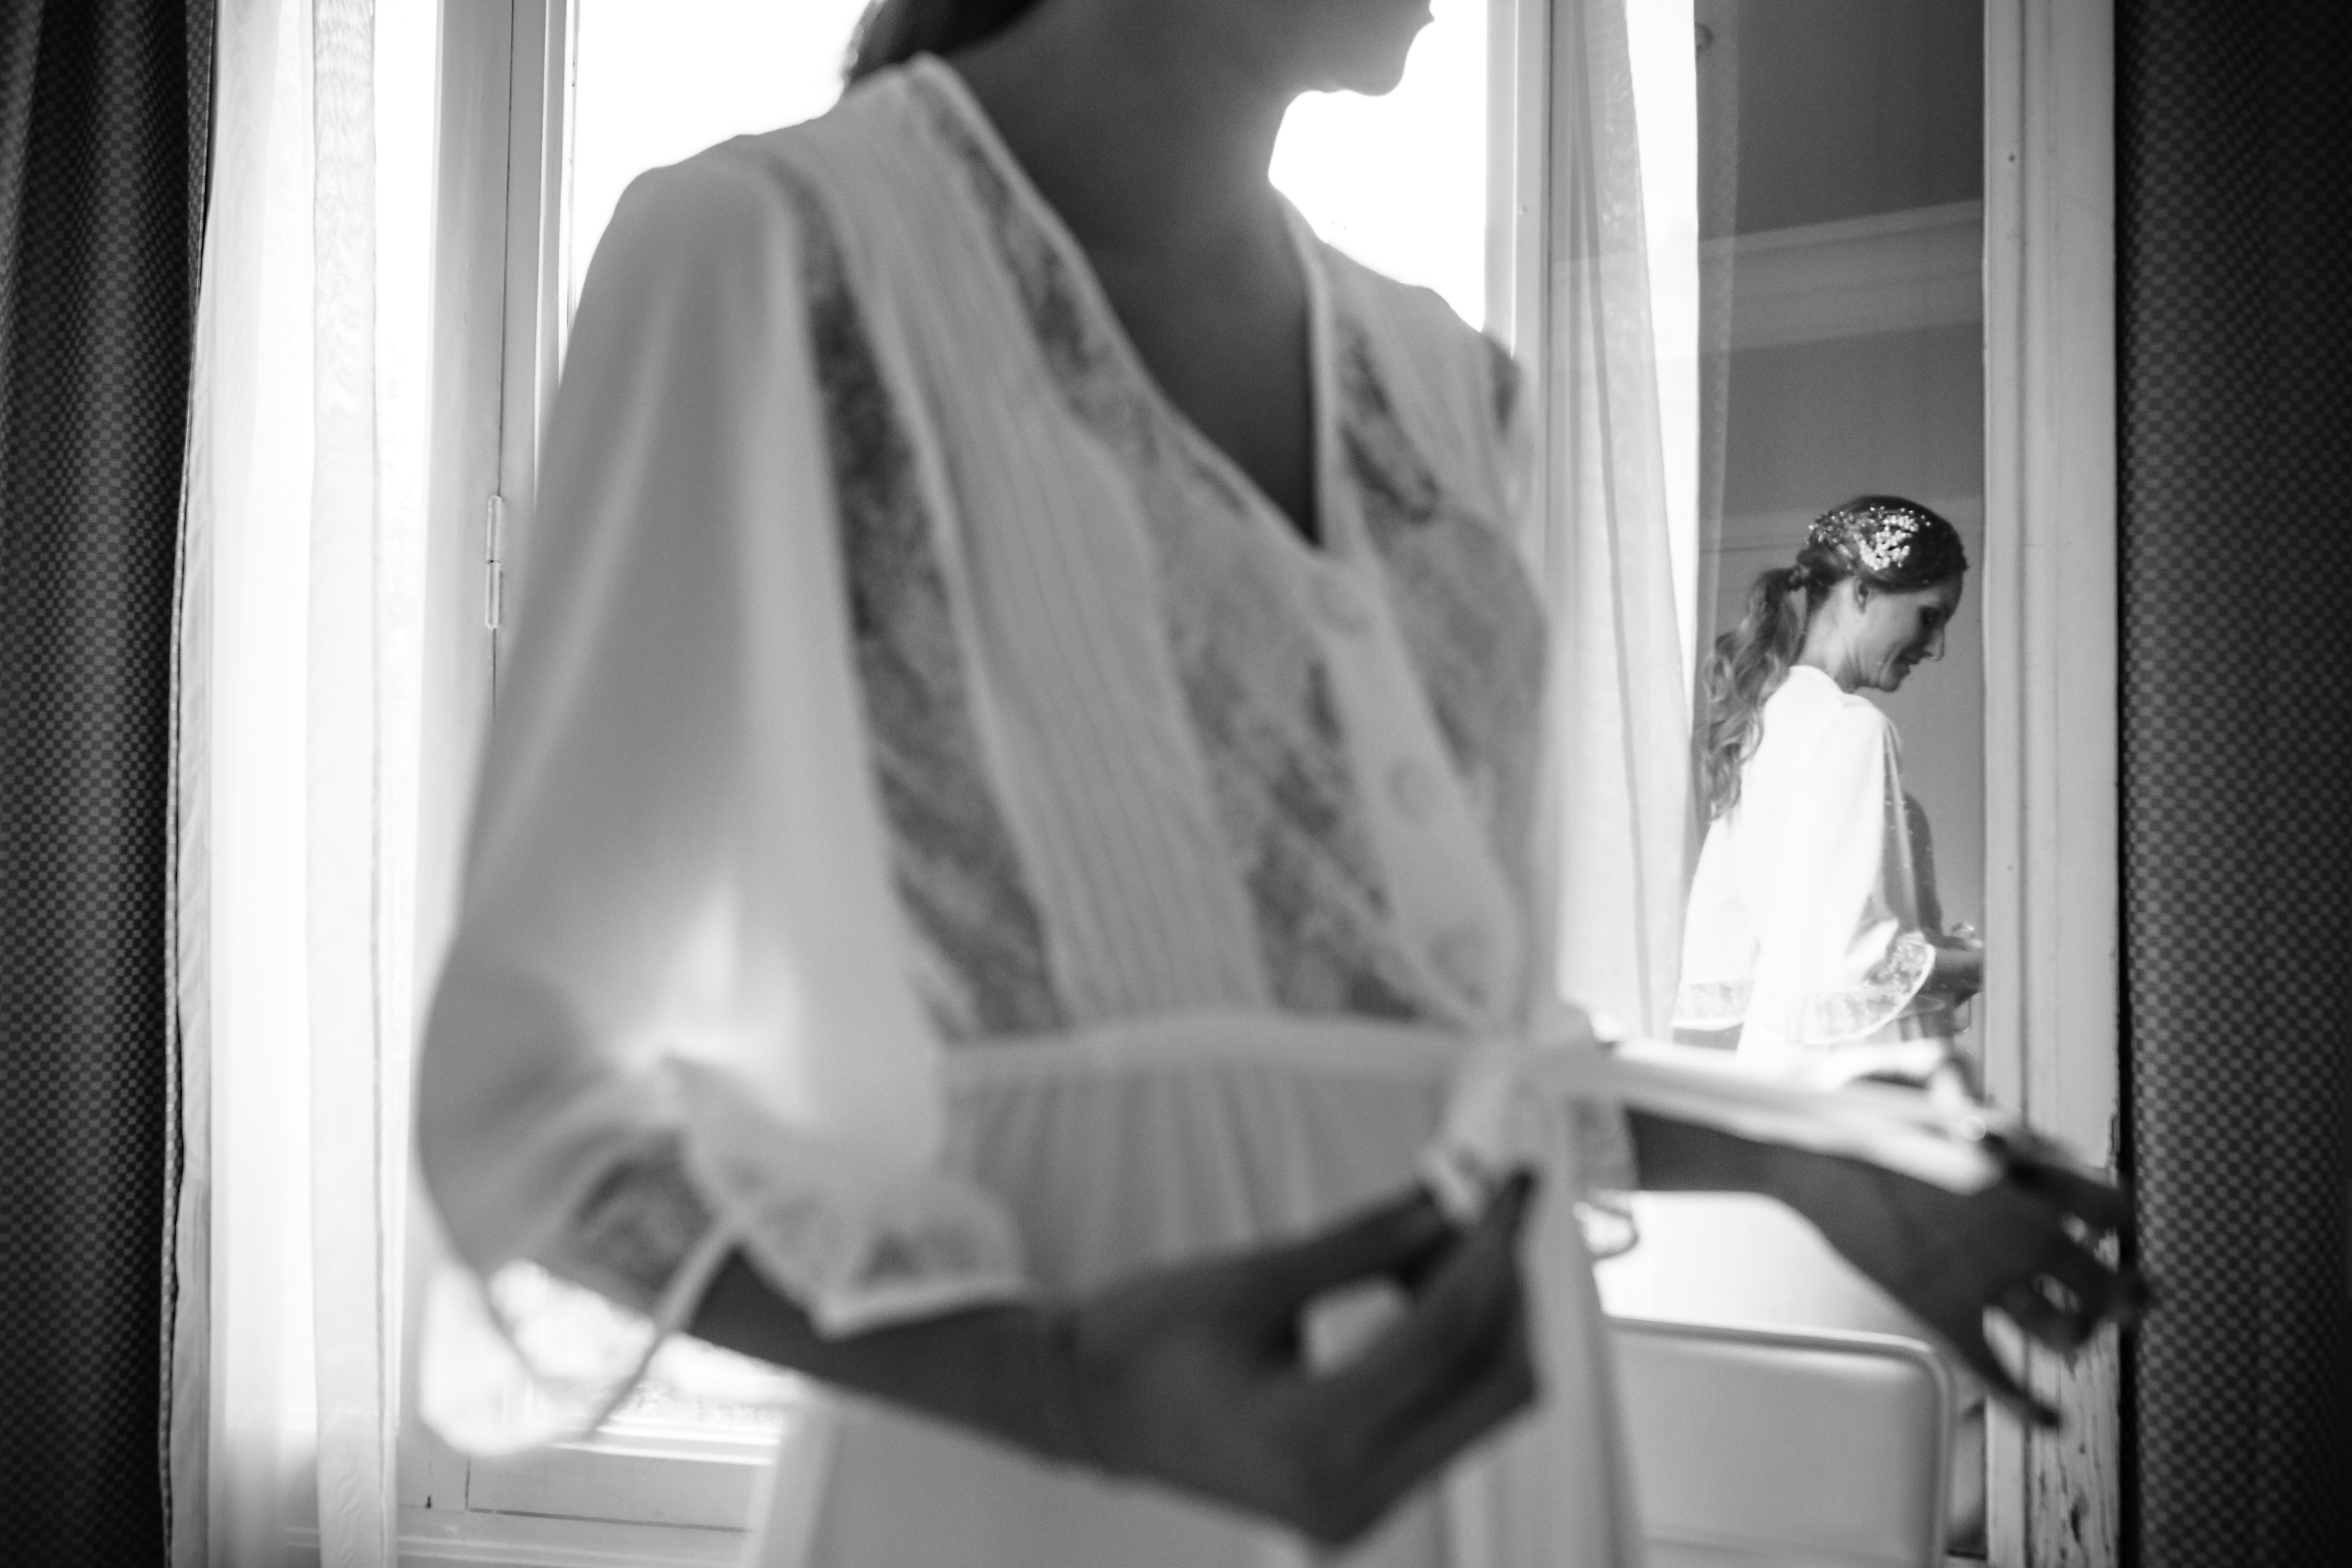 mandarina weddig, fotografos de boda, fotografo boda soria, fotografo boda barcelona, fotografo boda Madrid, fotografo boda lerida, fotografo boda Huesca_10